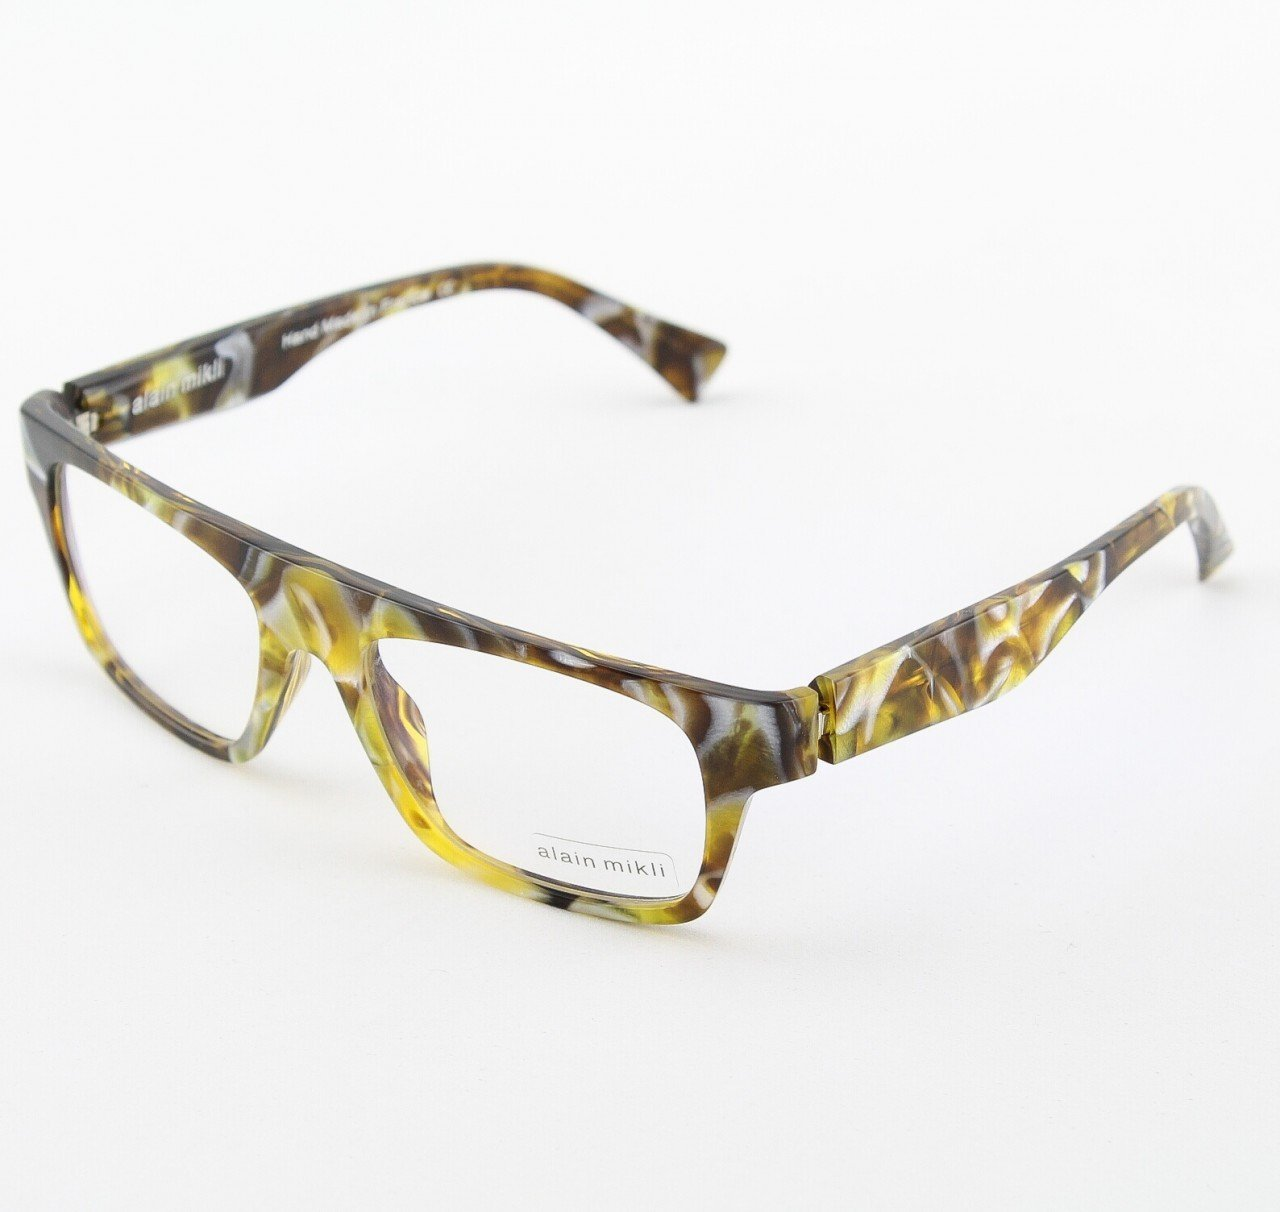 Alain Mikli Eyeglasses AL1047 Col. 201 Pearlized Gold and Brown